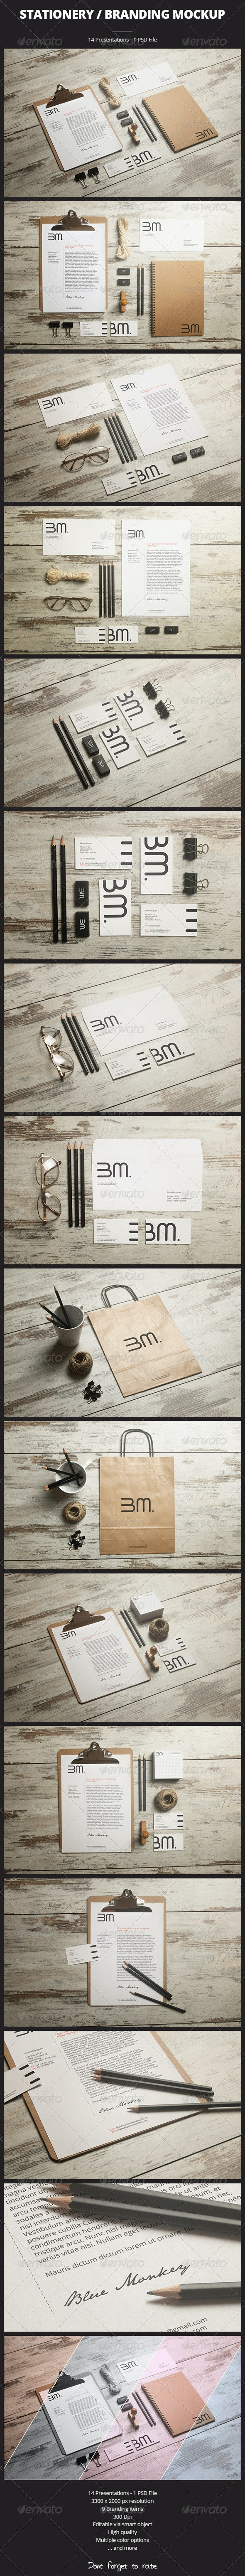 Stationery / Branding Mockup - Print Product Mock-Ups